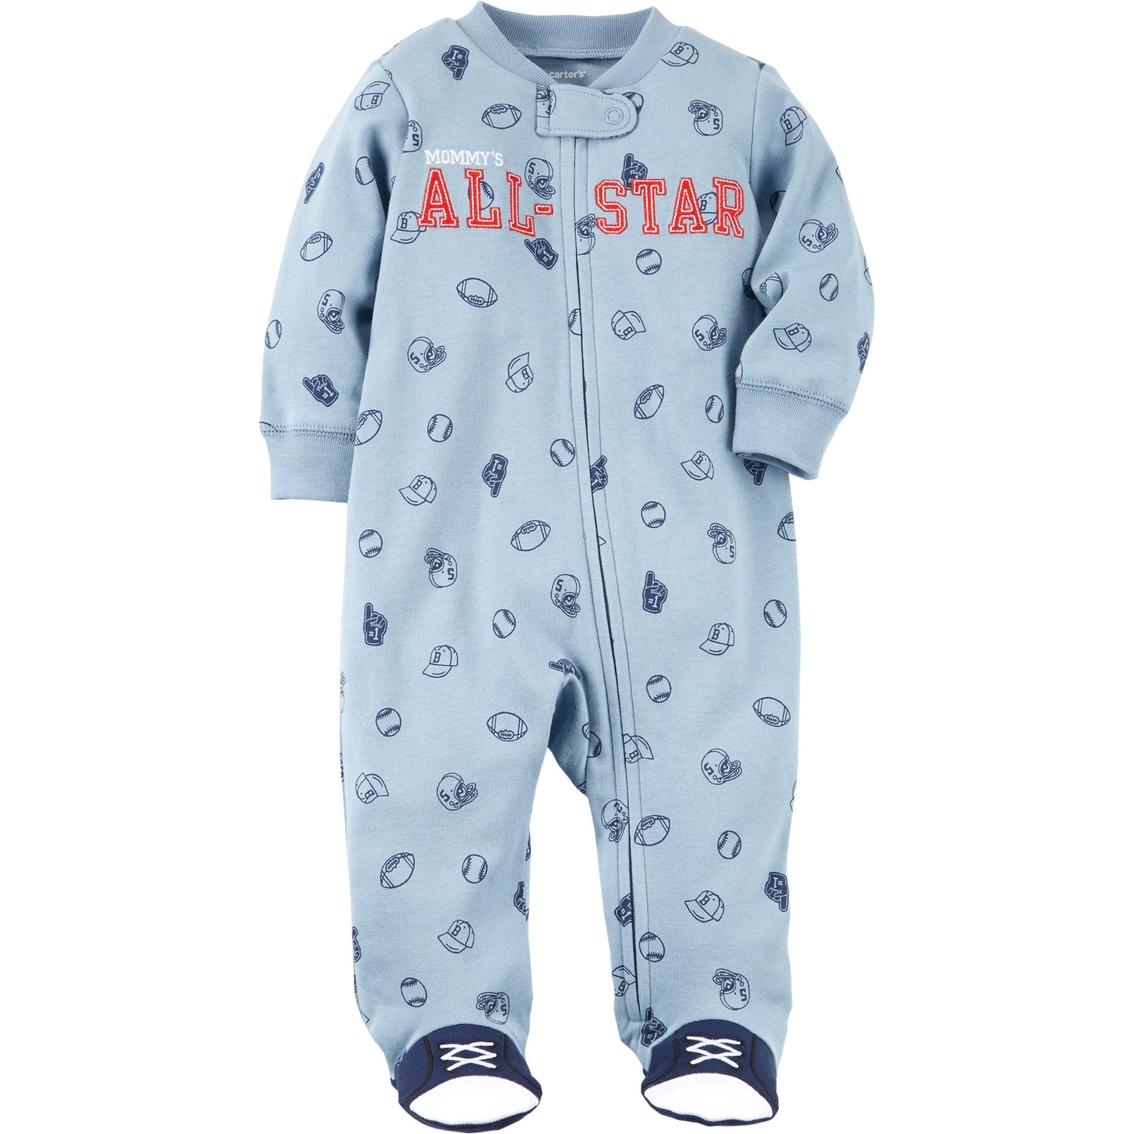 aecd31e7e Carter s Infant Boys Mommy s All Star Zip Up Sleeper